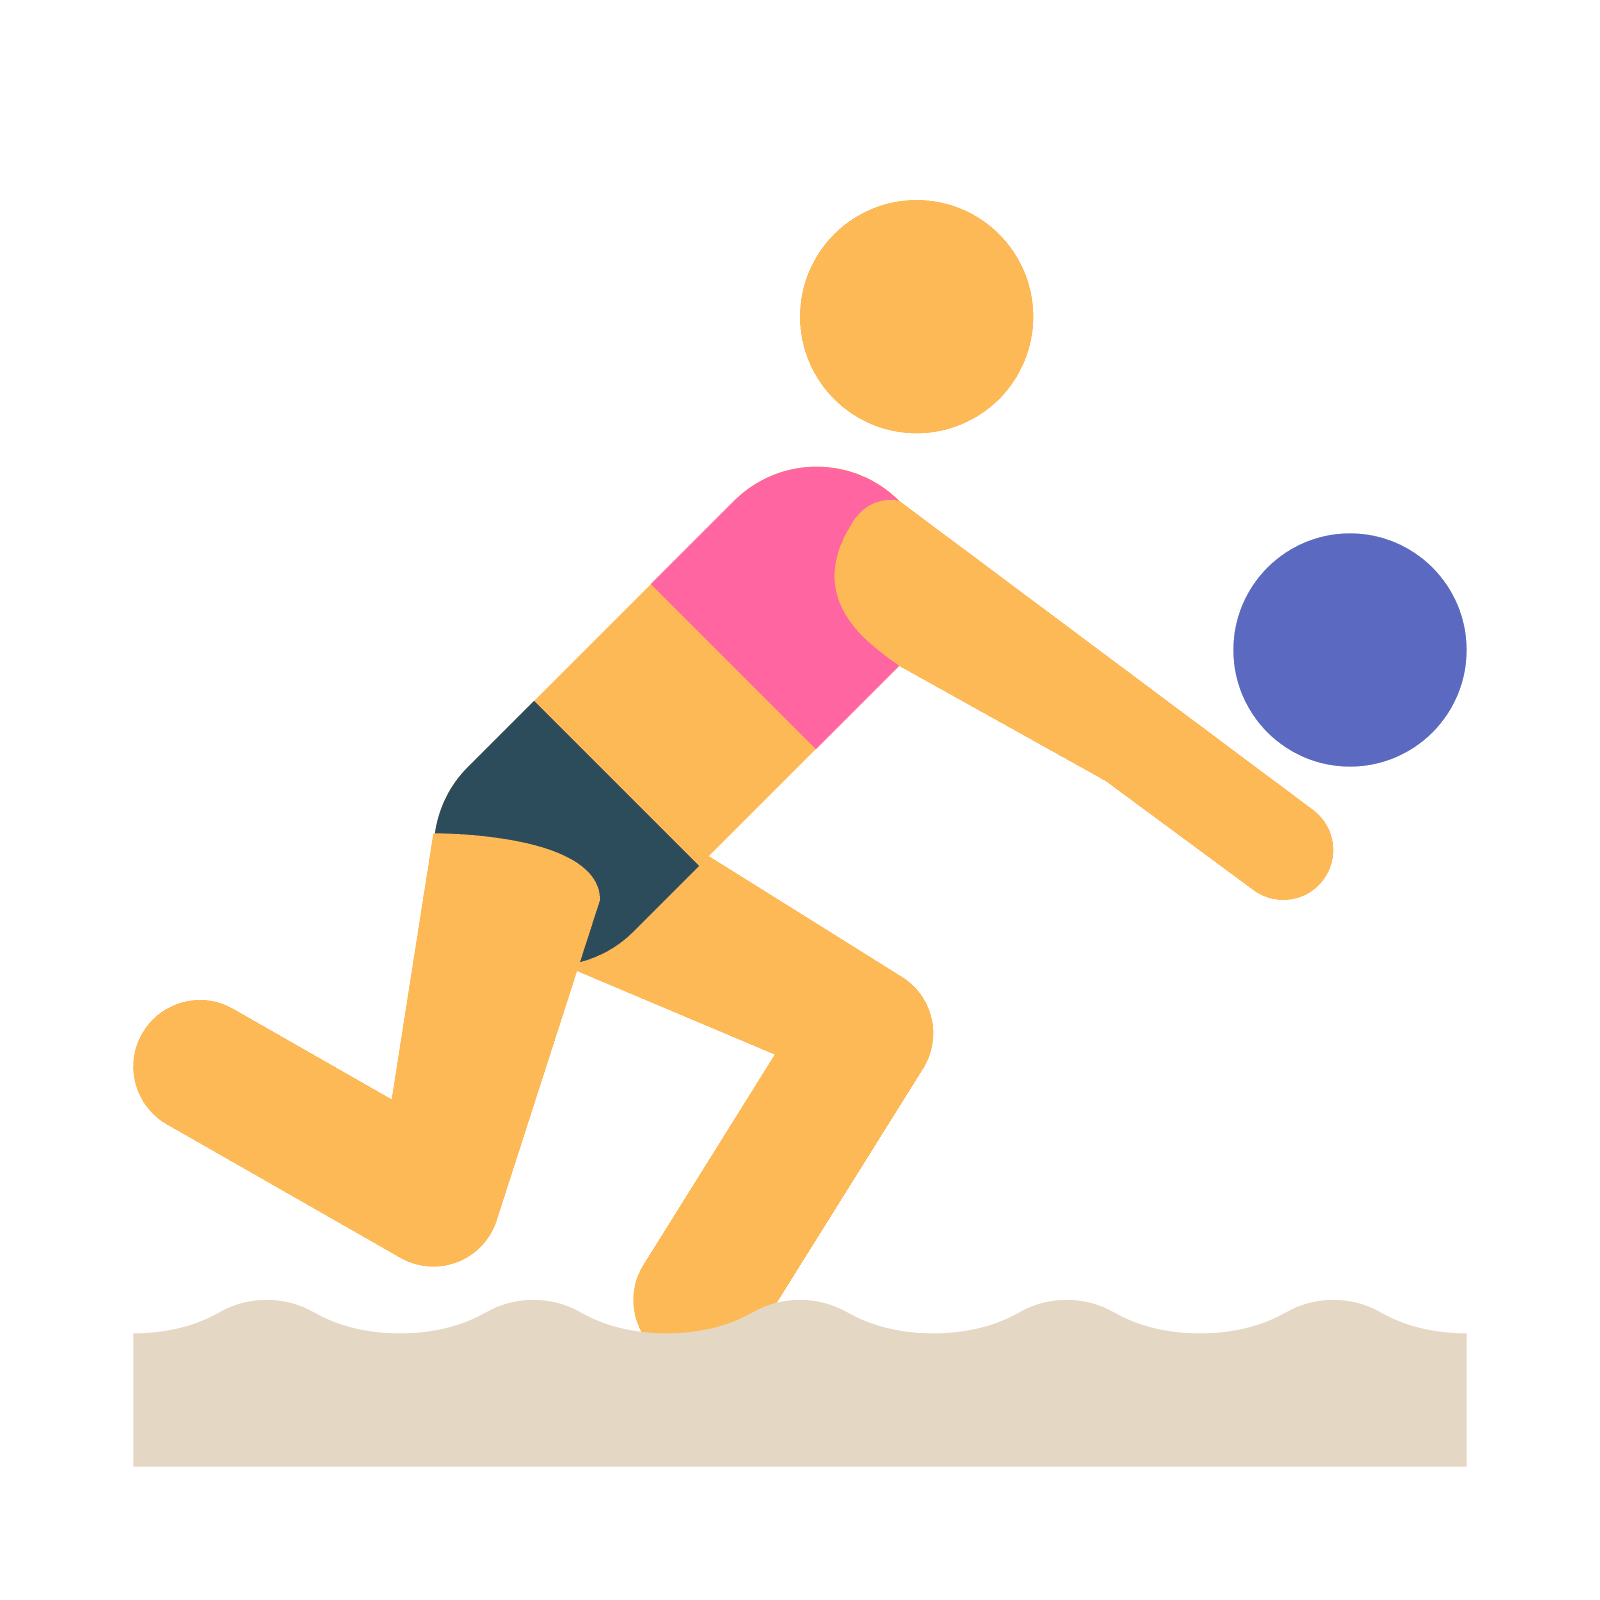 Icon beach free download. Emoji clipart volleyball